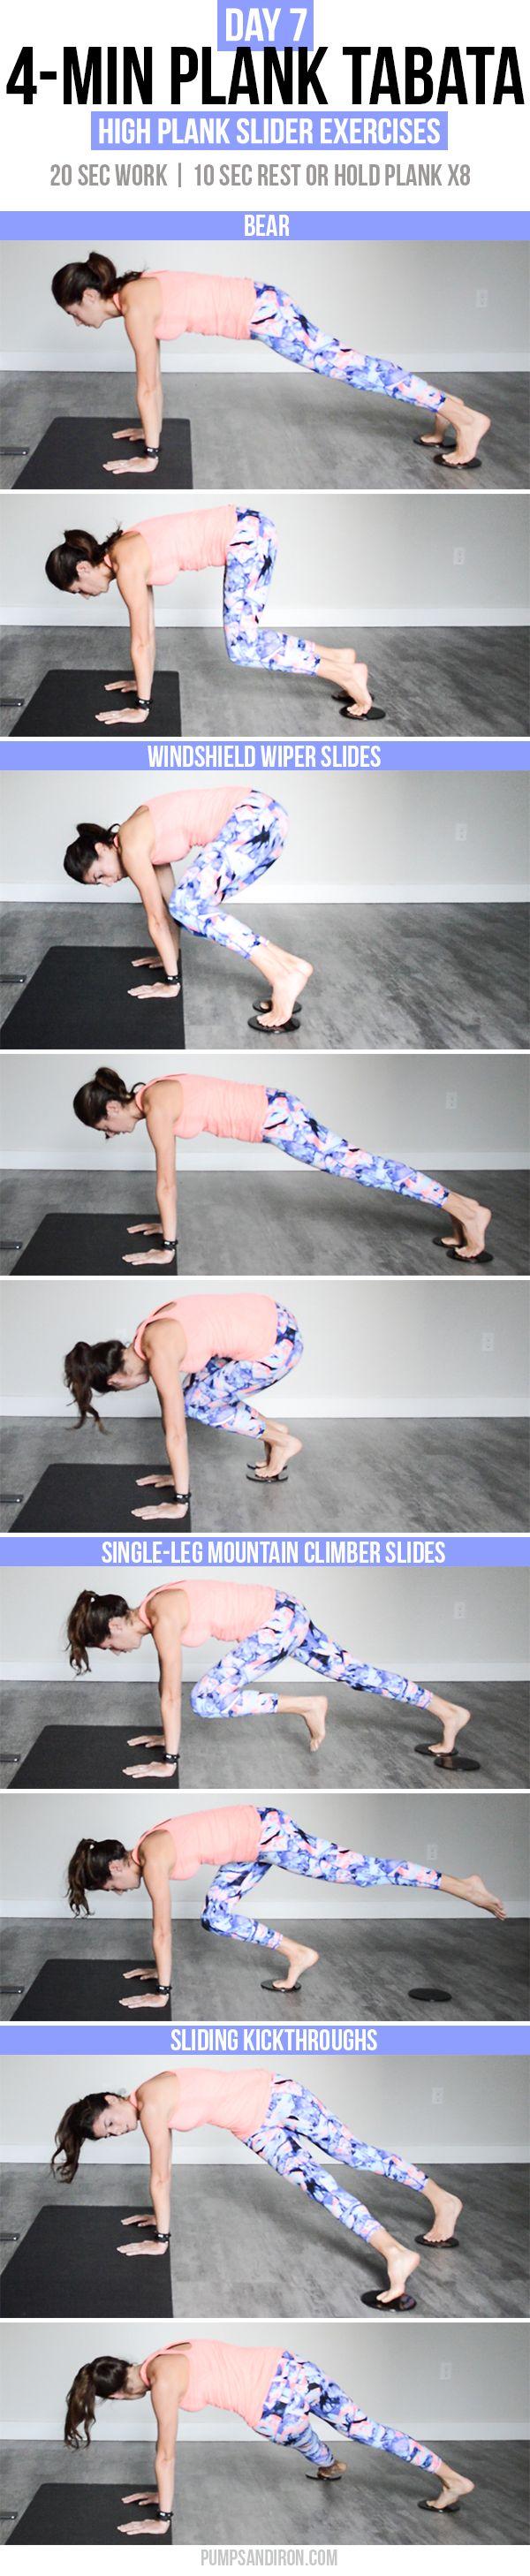 4-Minute Plank Tabata Challenge (Day 7): Slider Exercises